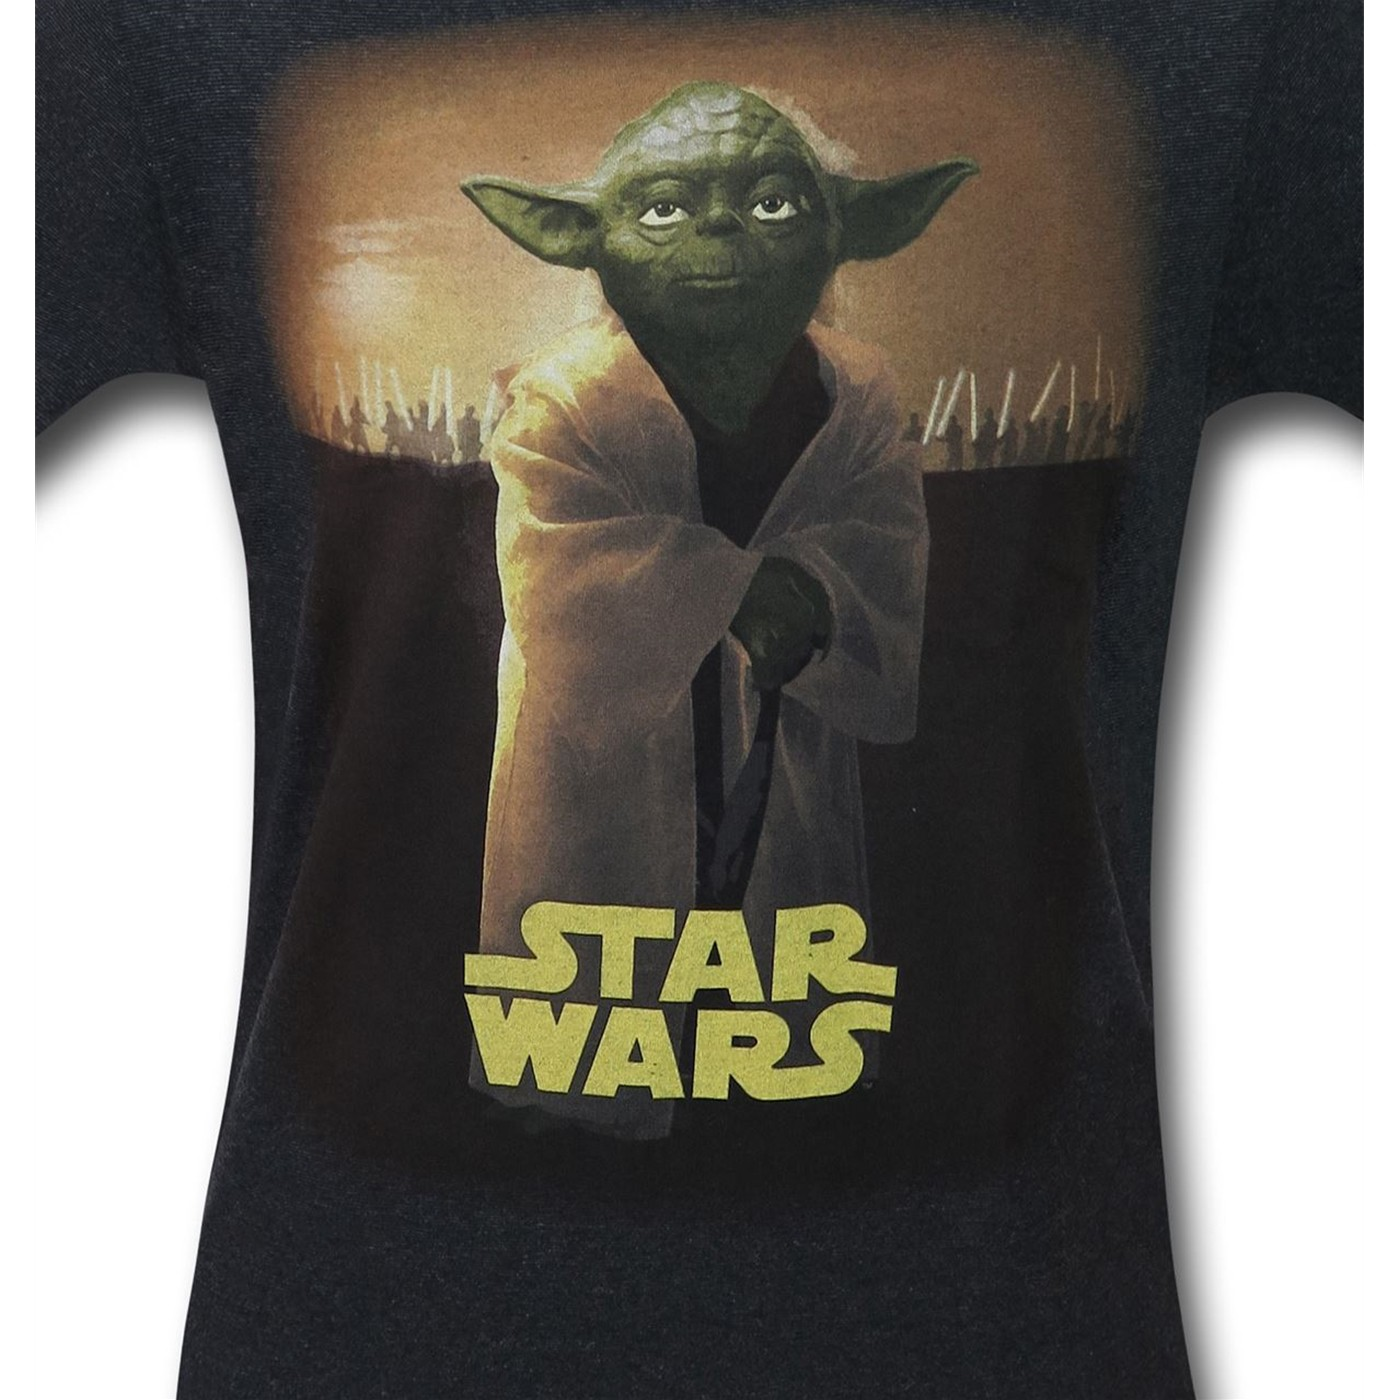 Star Wars Yoda Solemn Portrait Men's T-Shirt